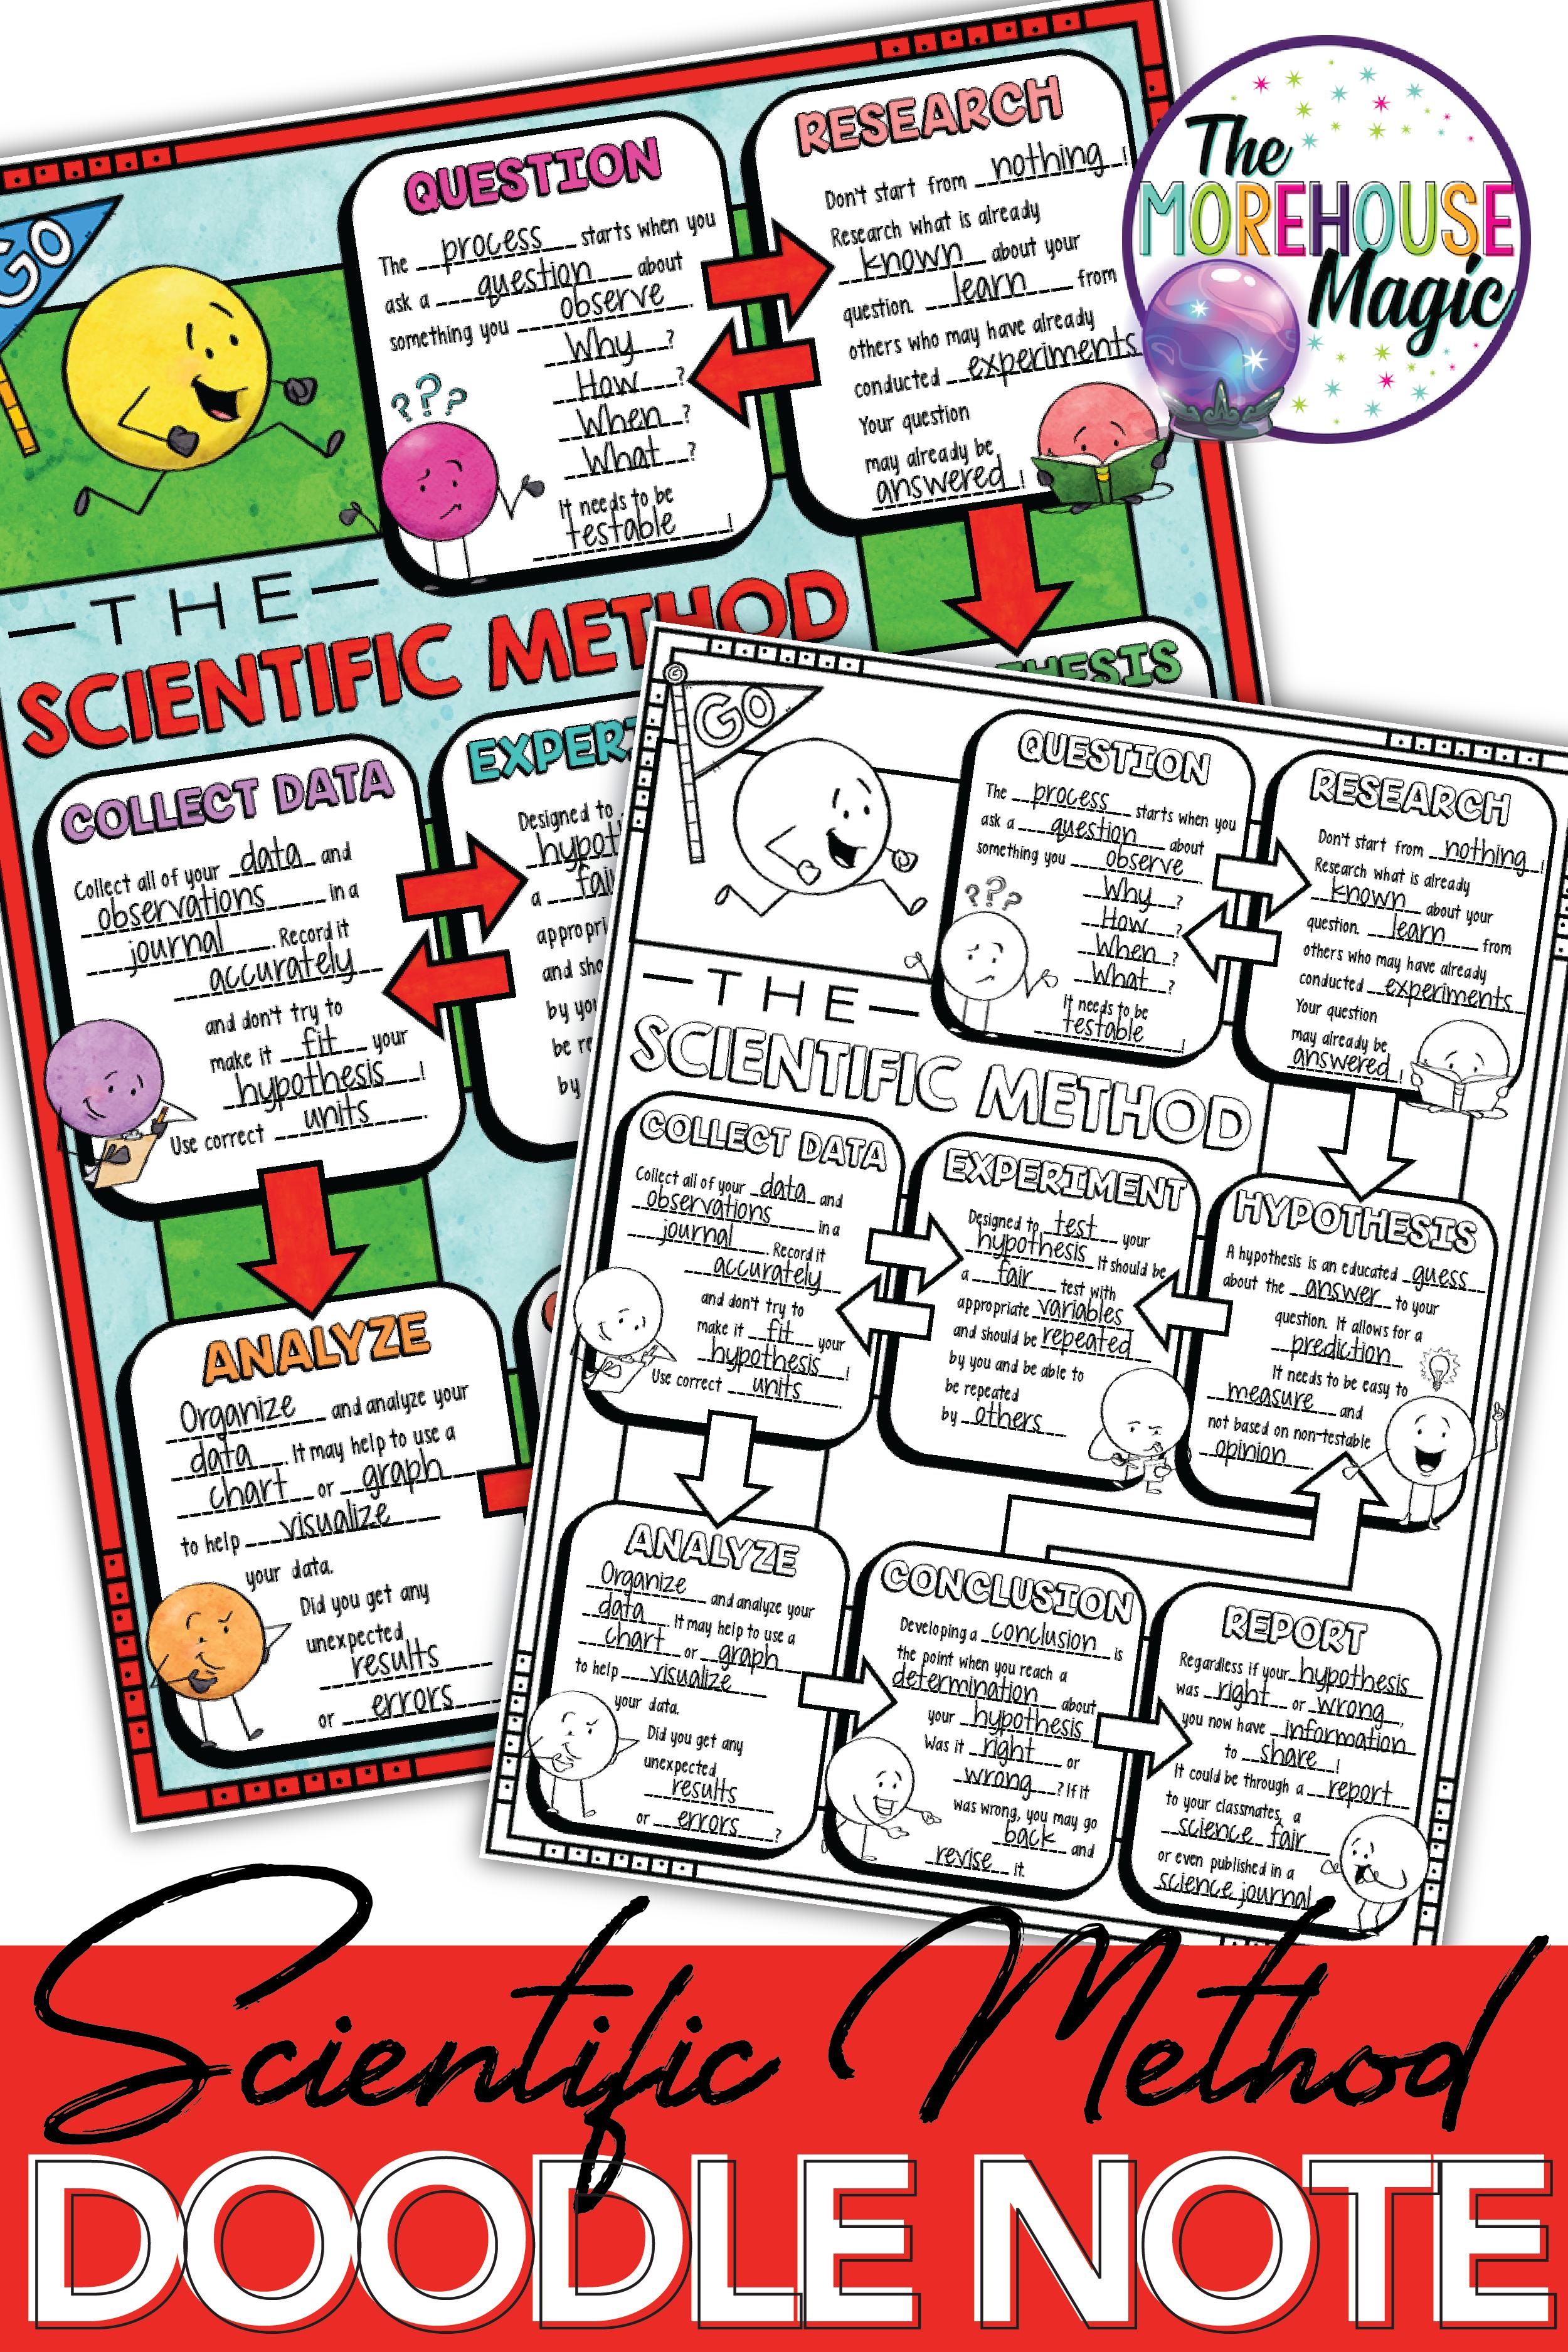 The Scientific Method Doodle Note With Powerpoint Quiz Scientific Method Doodle Notes Doodle Notes Science [ 3750 x 2500 Pixel ]